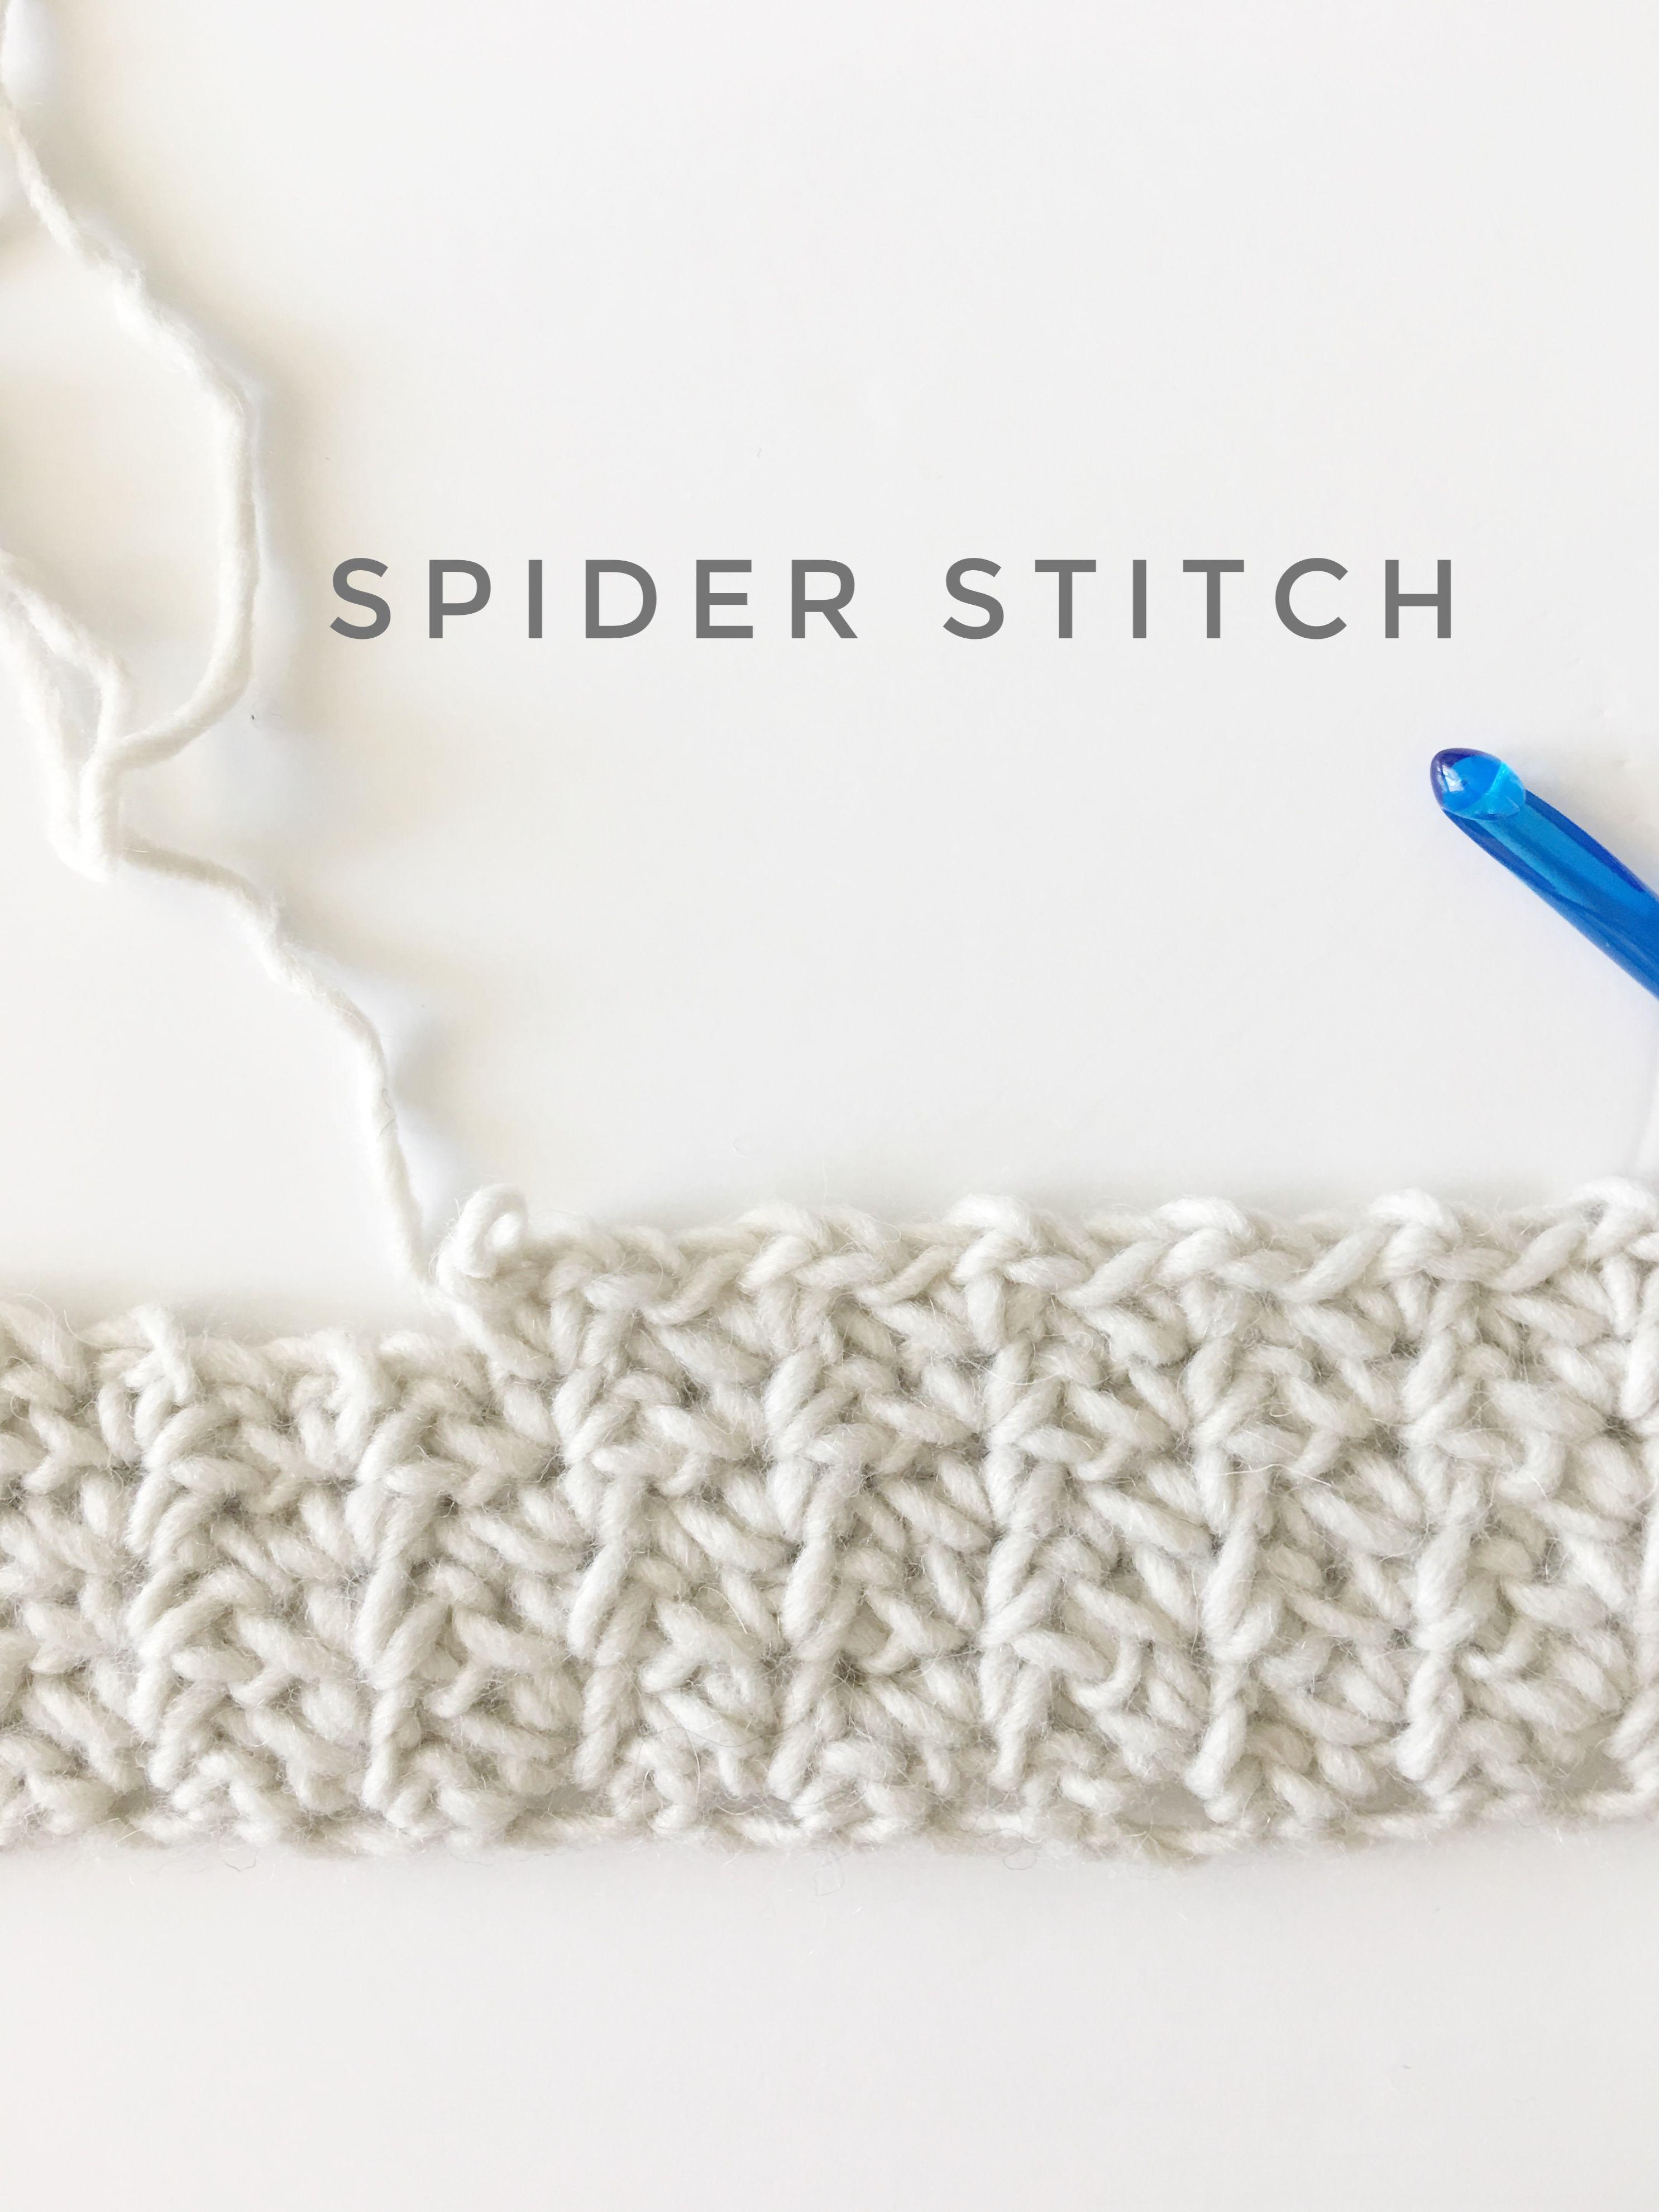 Spider Stitch - Daisy Farm Crafts | Crochet stitches~♤ | Pinterest ...